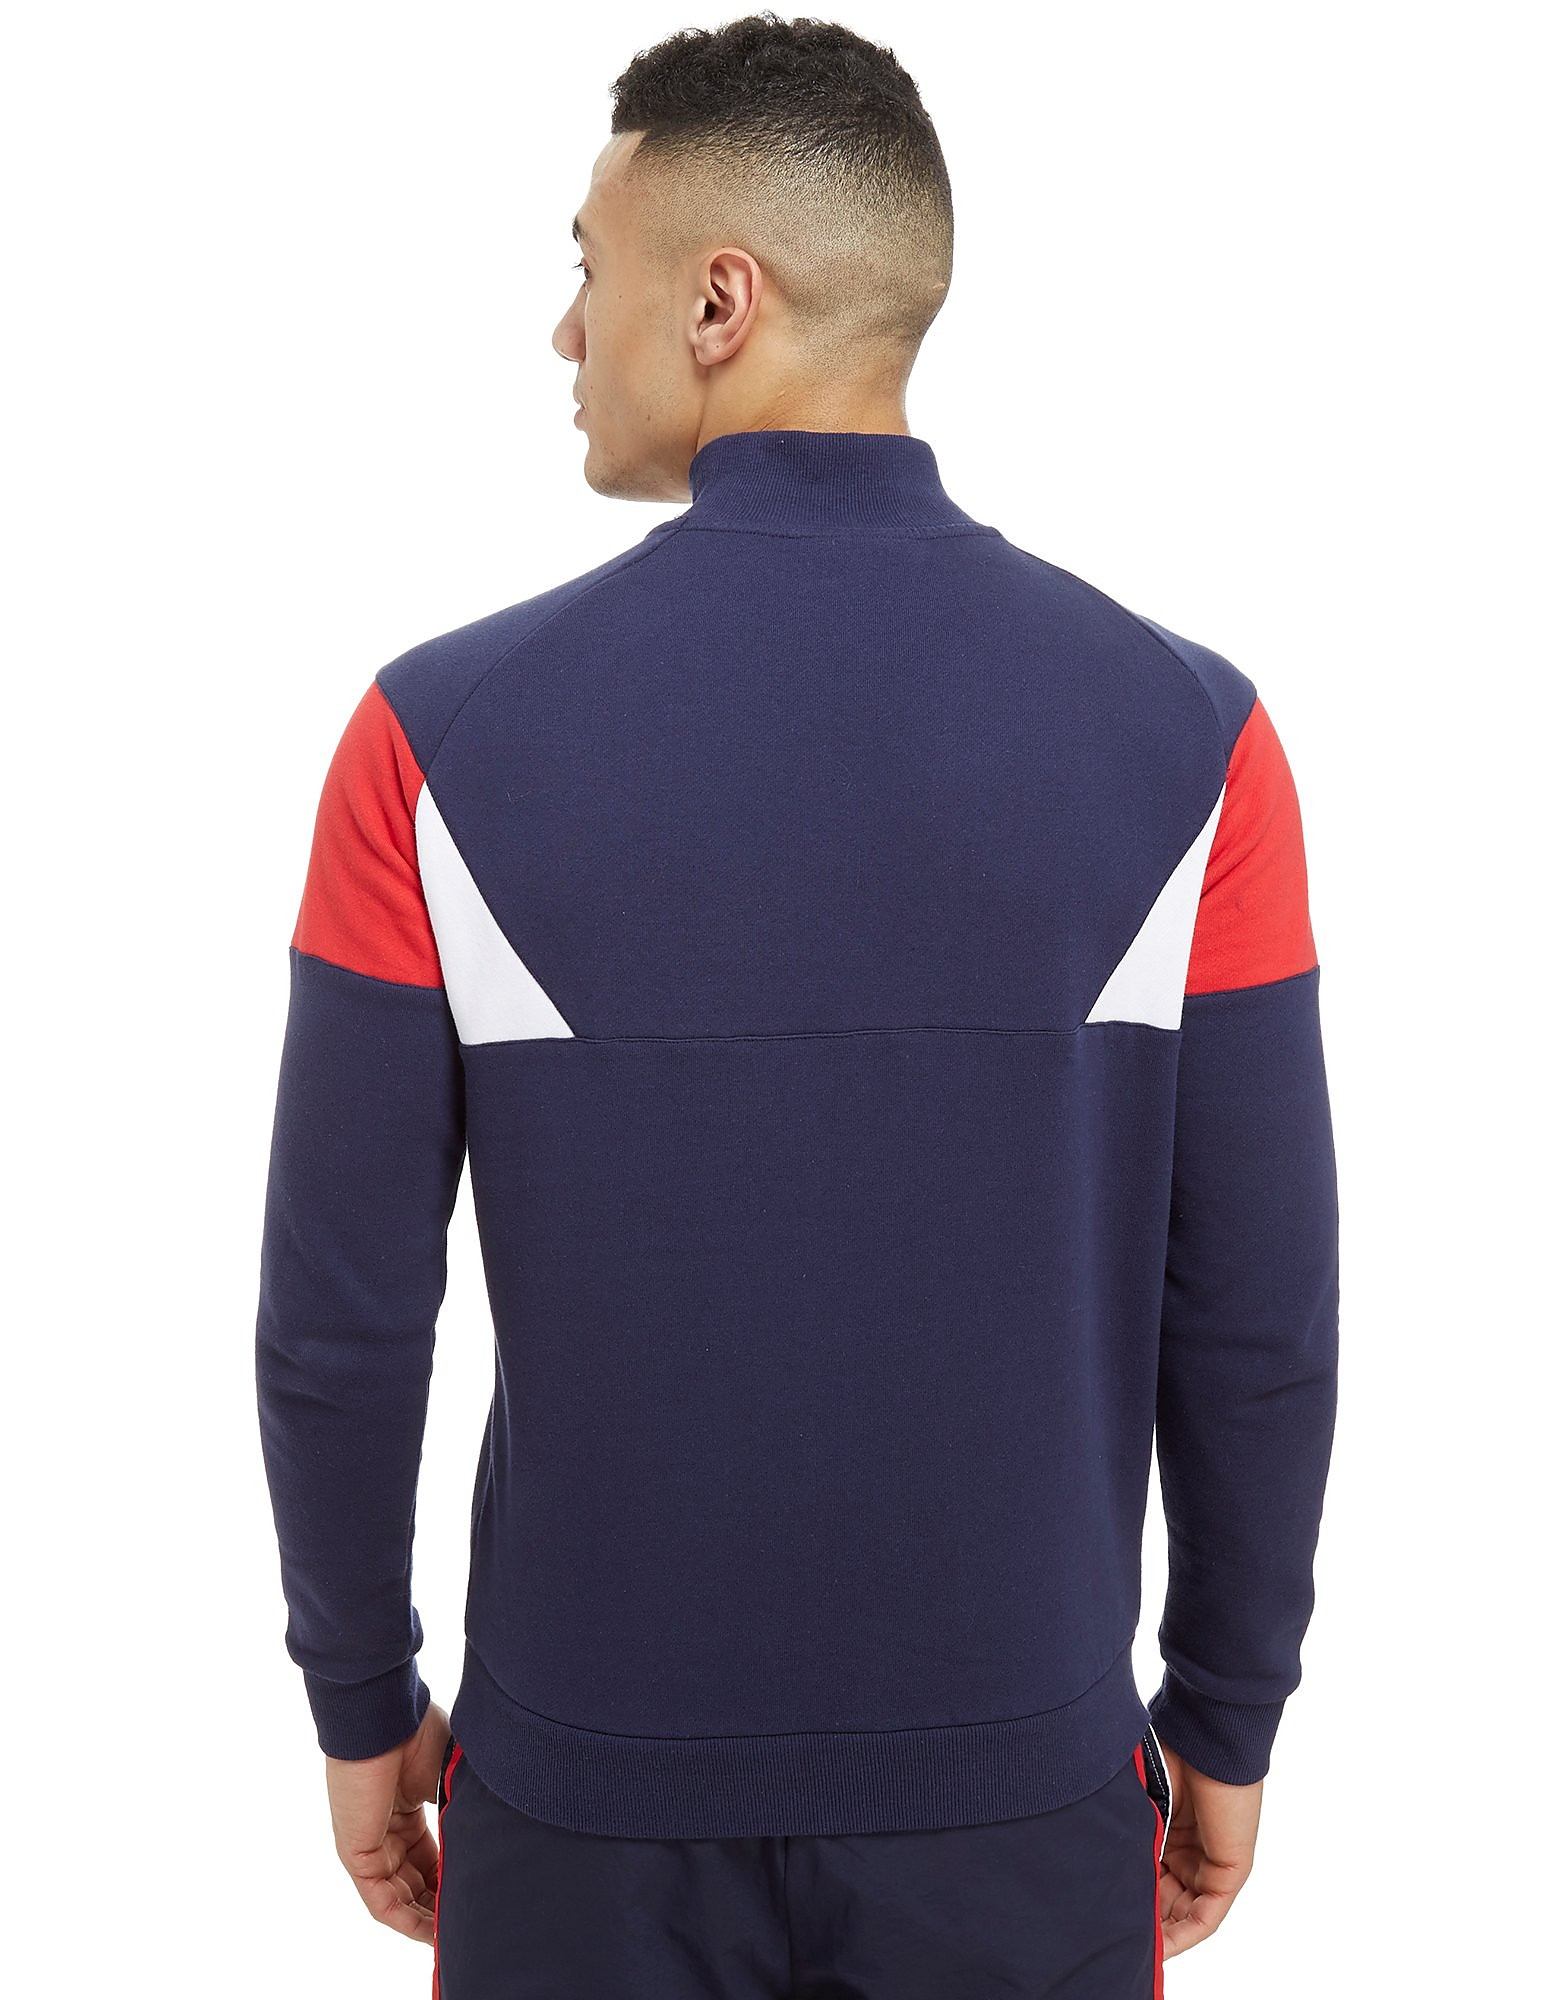 Fila Dunne 1/2 Zip Sweatshirt